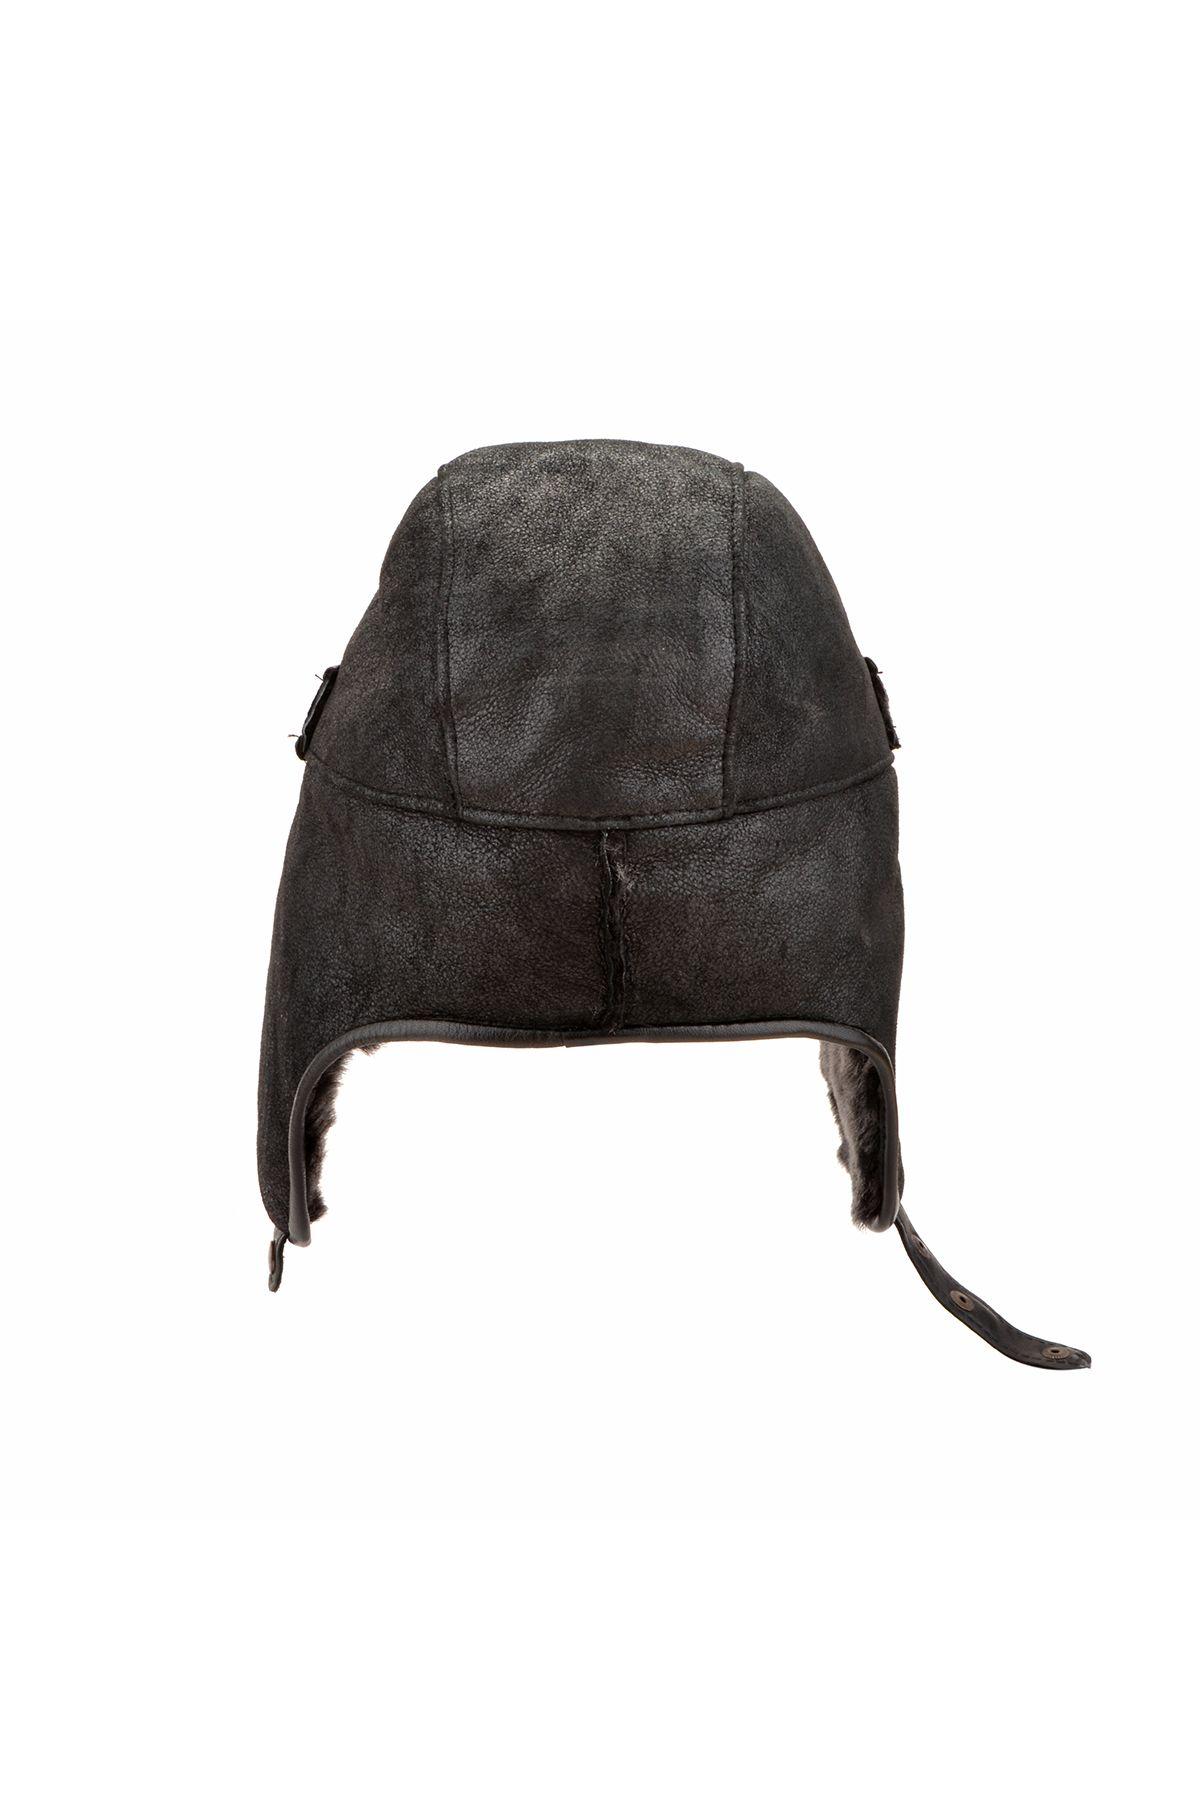 Pegia Hakiki Deri İçi Kürk Pilot Şapka 18AS16 Siyah